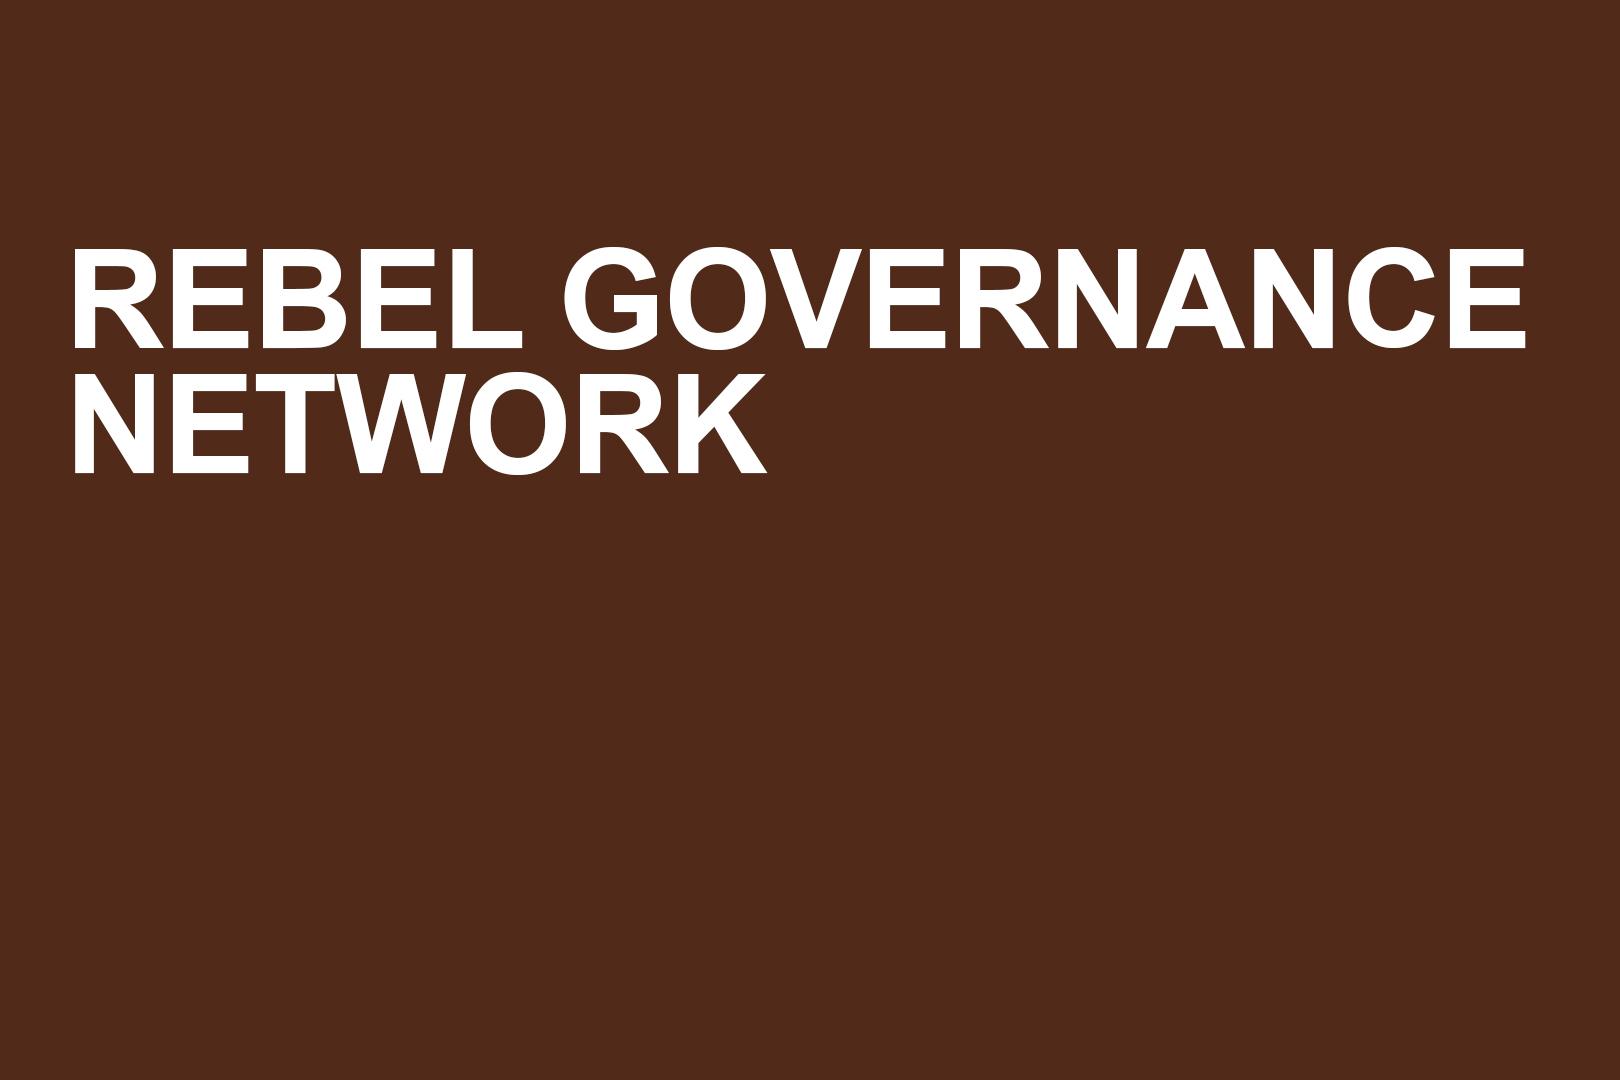 Rebel Governance Network